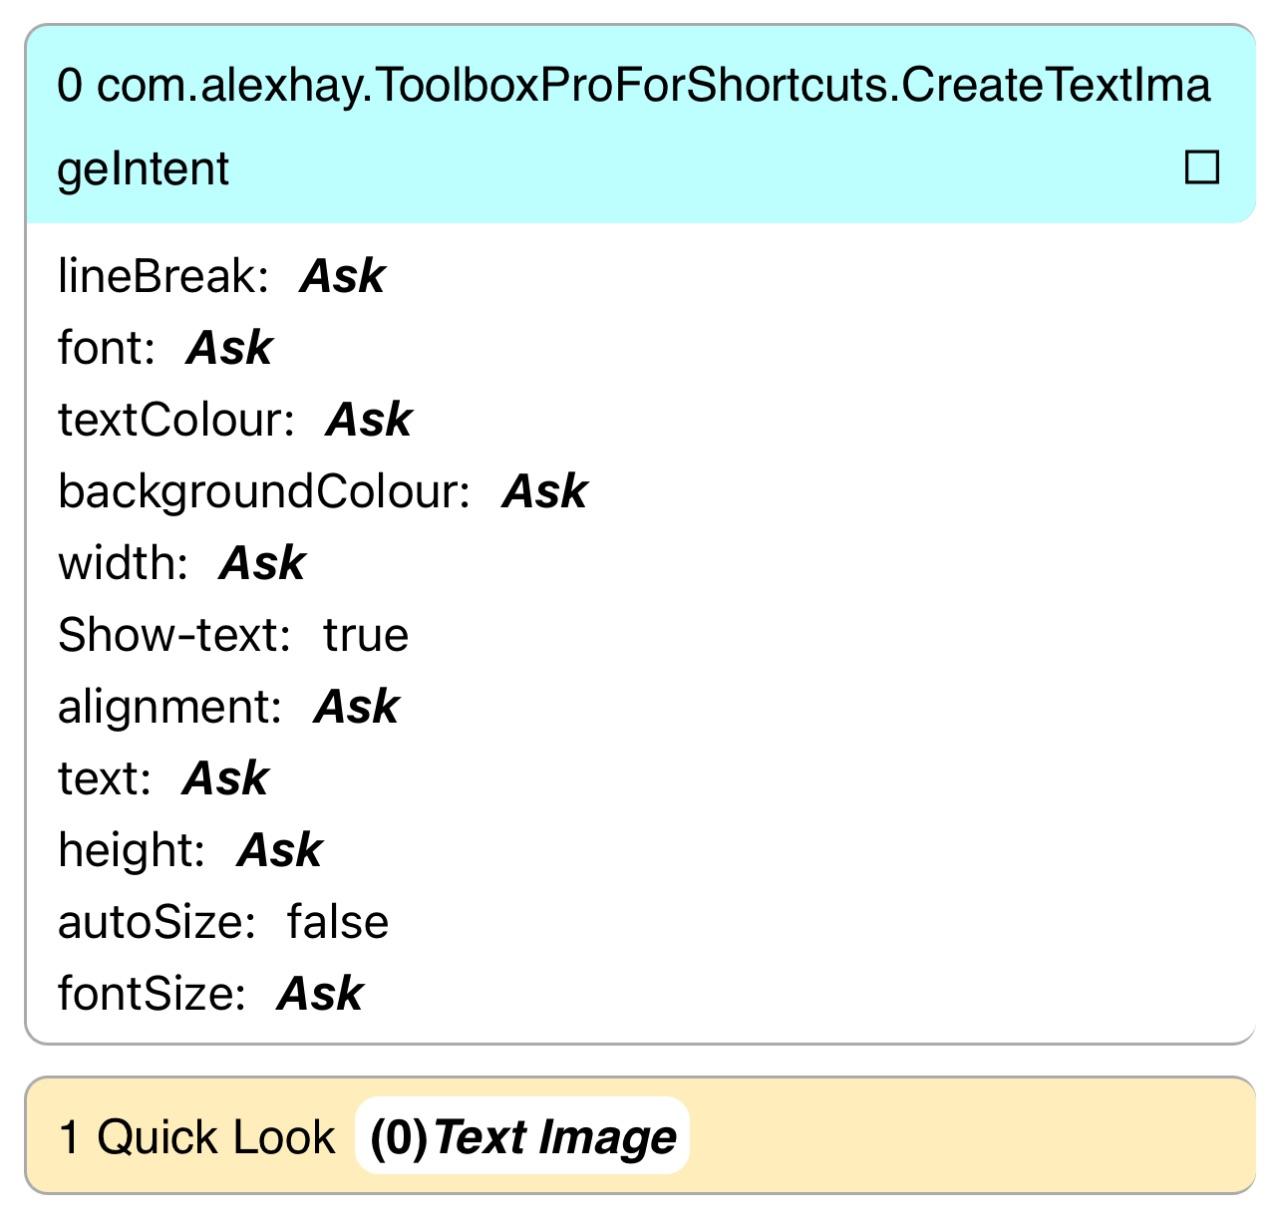 Custom Text Image Source